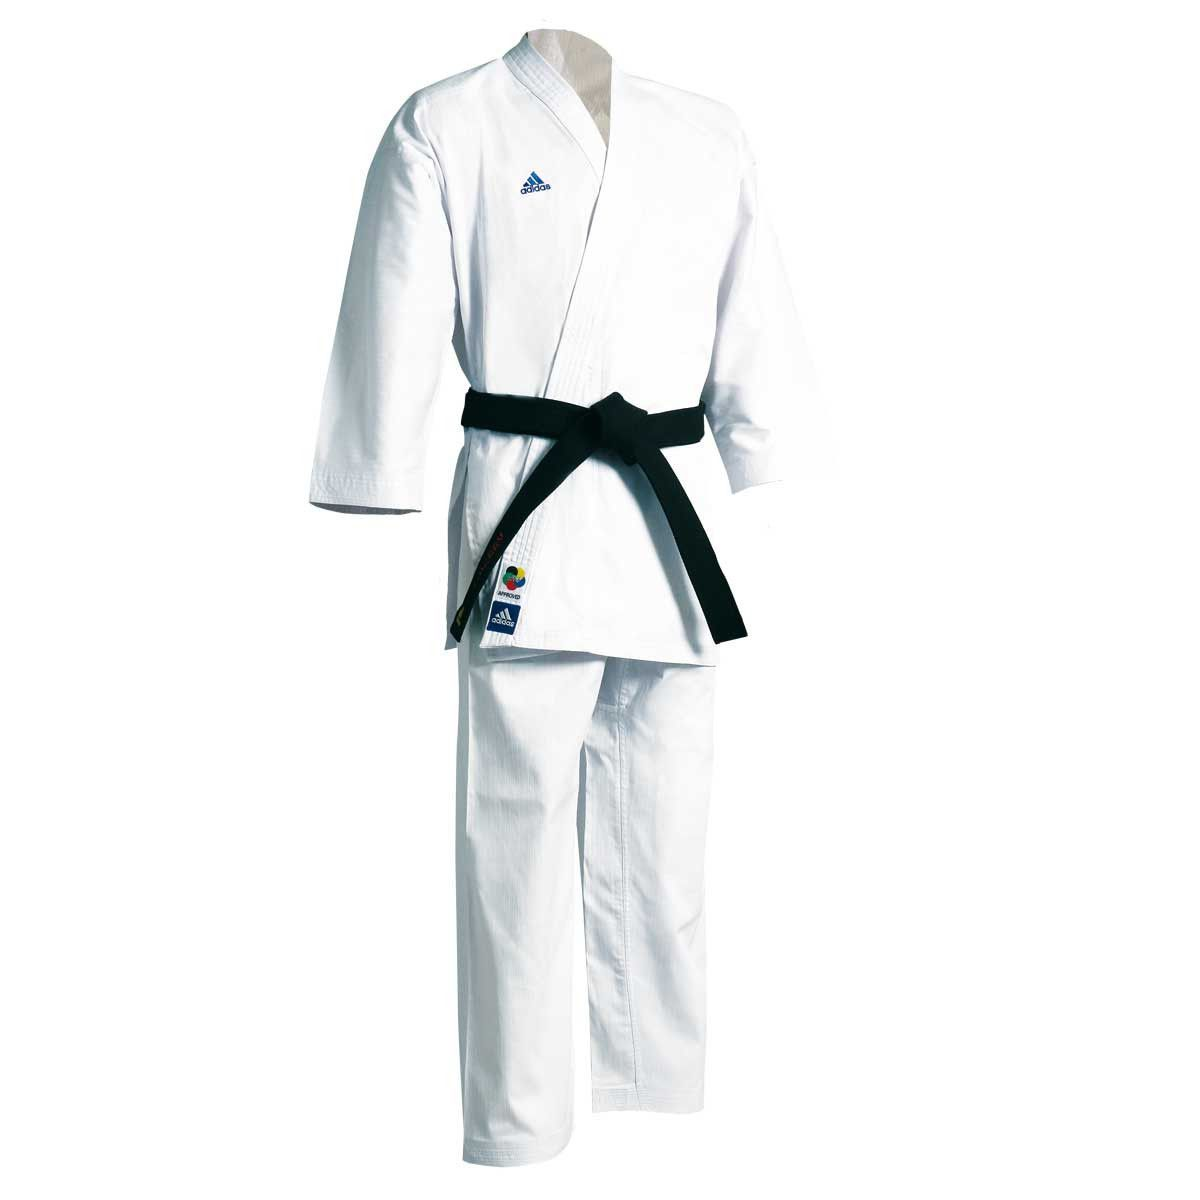 dbf13e3d678 K220SK Adidas Karate Grand Master Gi d U220SK. K220SK Adidas Karate Grand  Master Gi d U220SK Adidas Karate Gi 65% Polyester 35% Cotton blend  herringbone ...